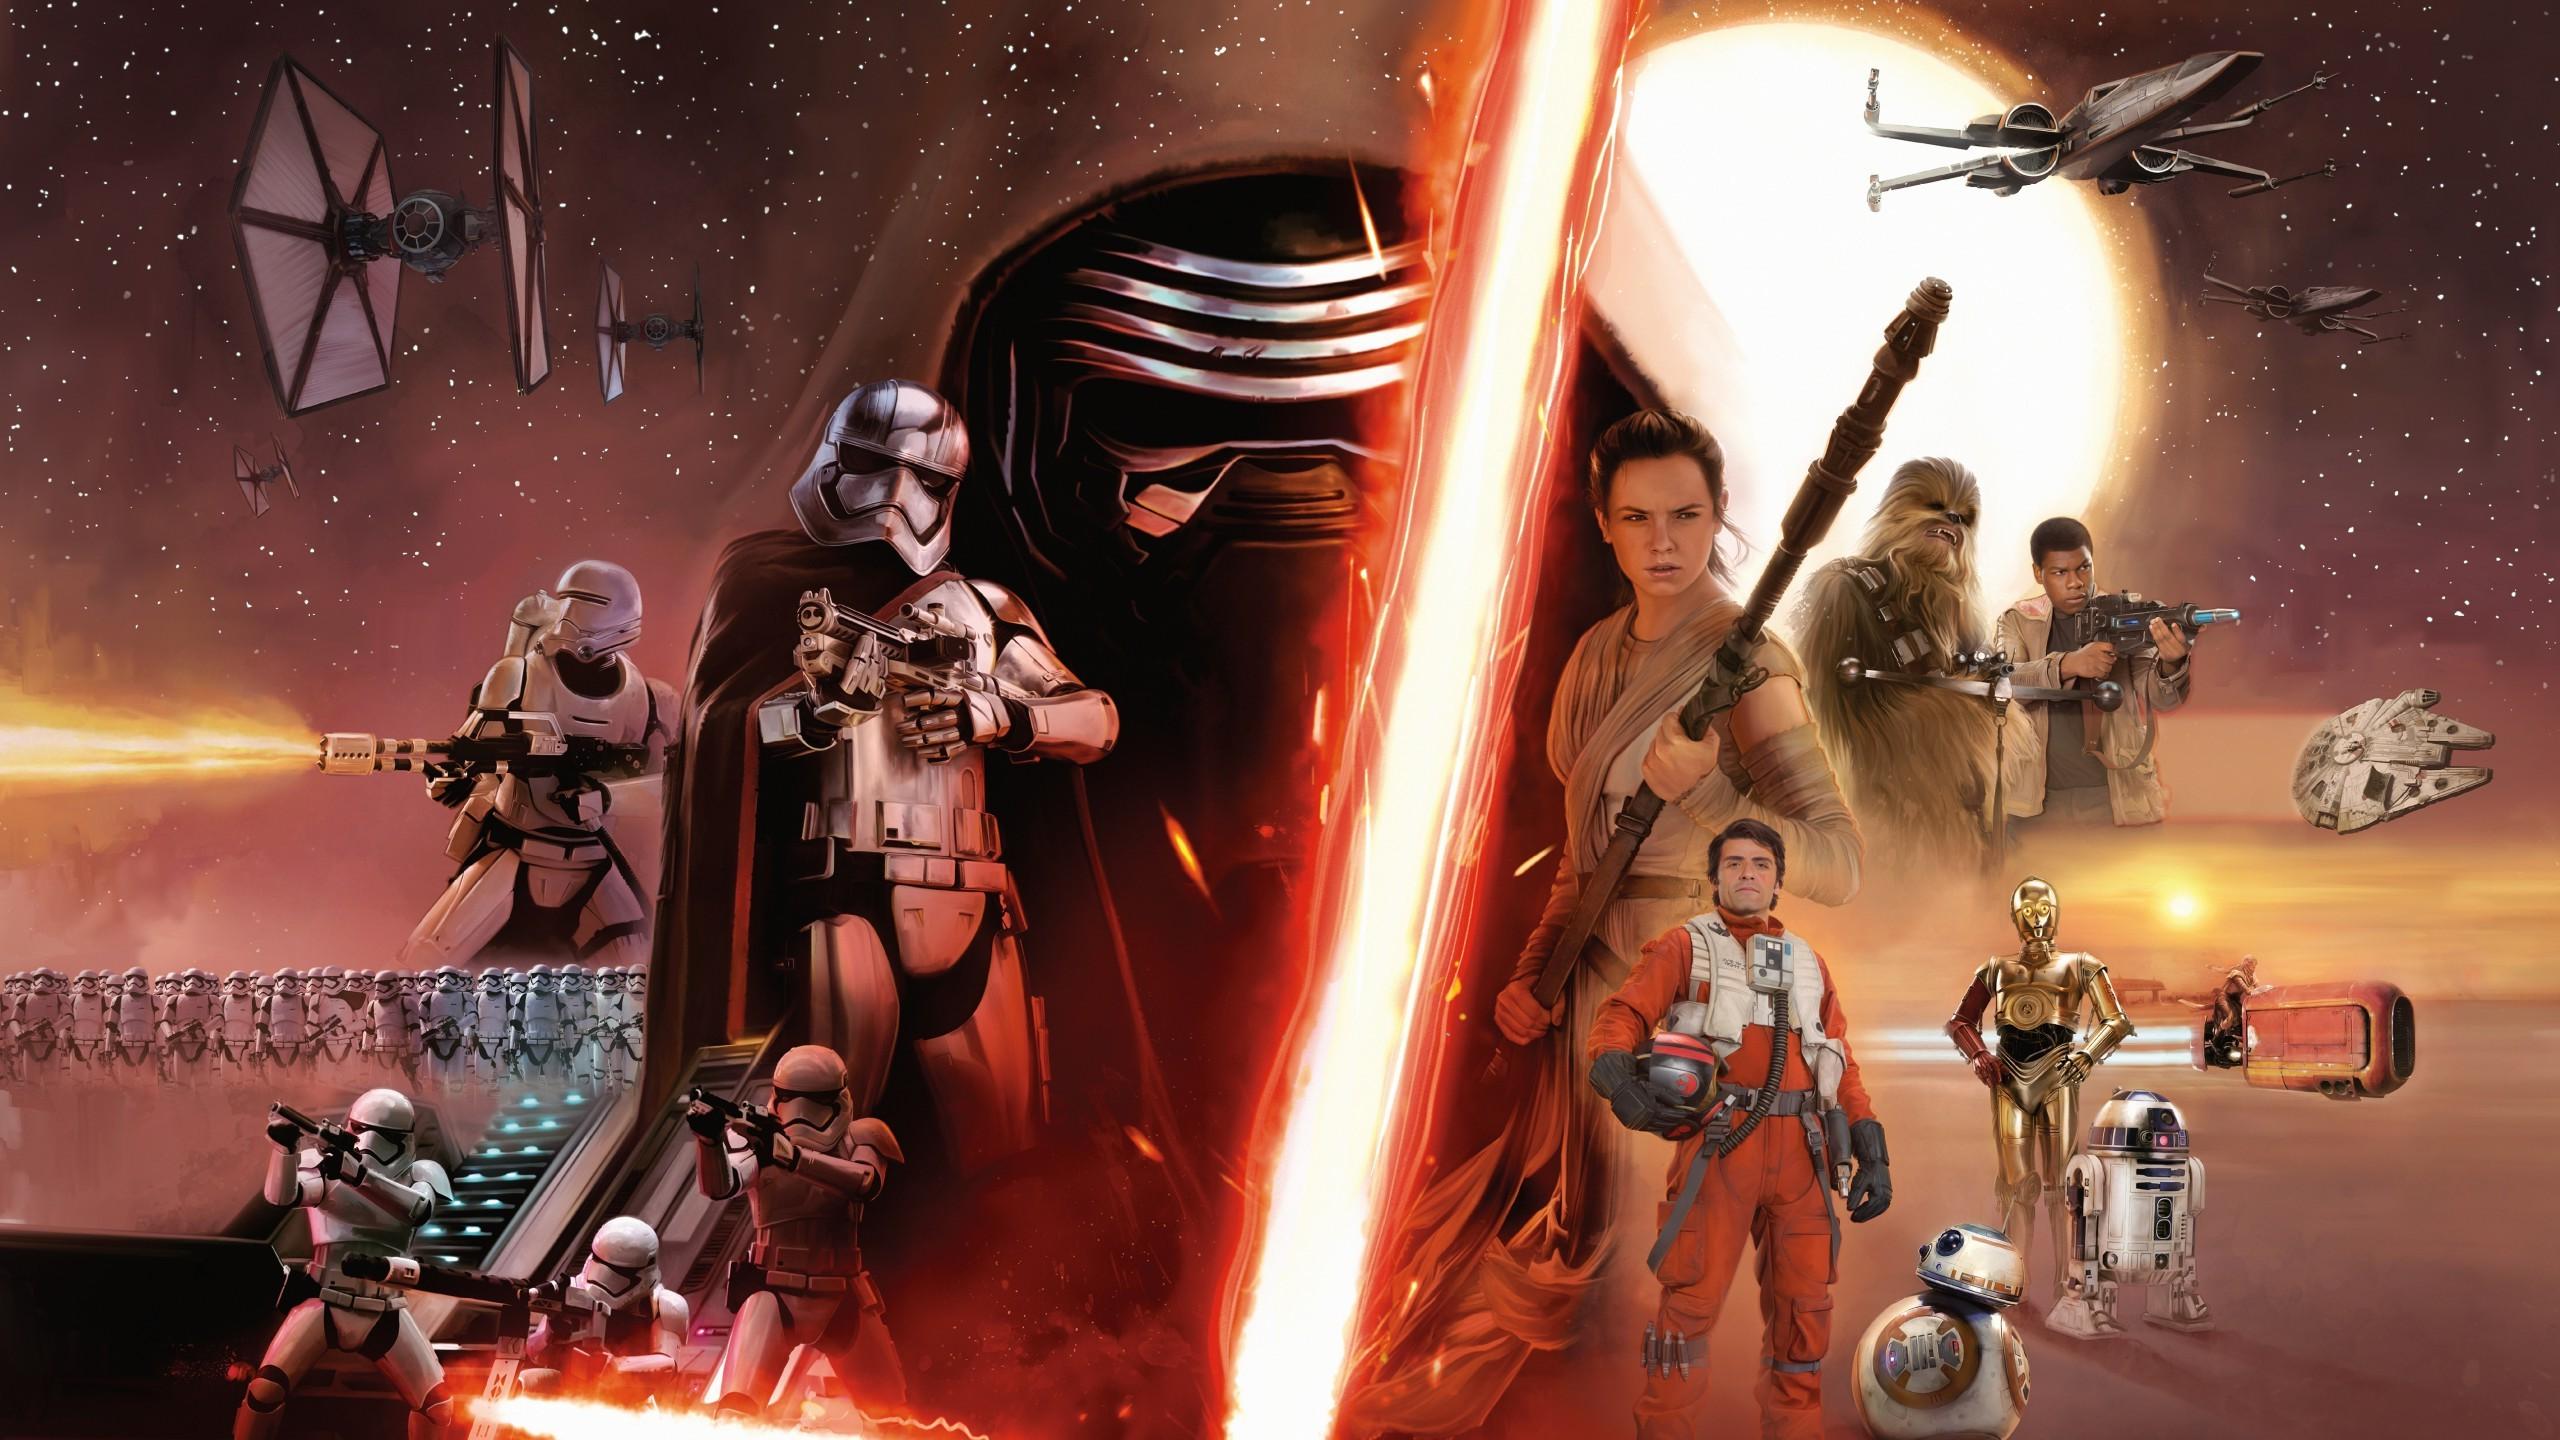 Wallpaper 2560x1440 Px Bb 8 C 3po Captain Phasma Chewbacca Han Solo Jedi Kylo Ren Lightsaber Luke Skywalker Millennium Falcon R2 D2 Sith Star Wars Star Wars Episode Vii The Force